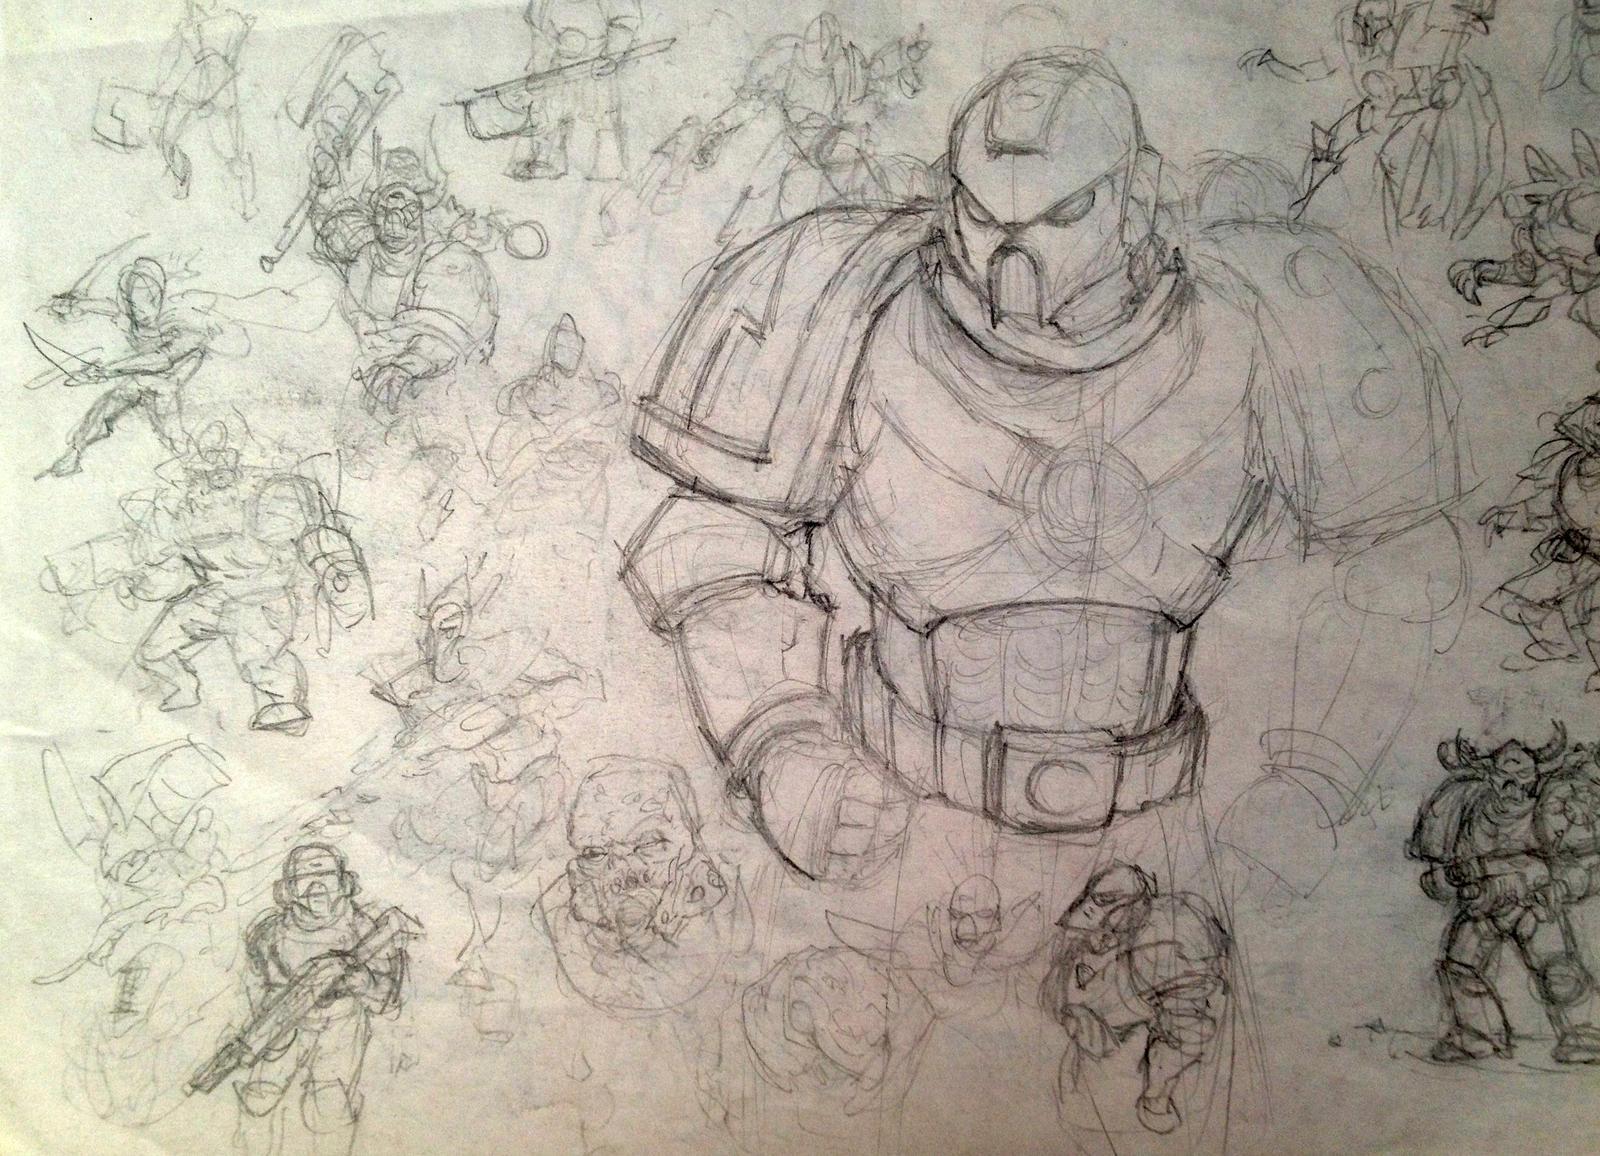 Sketch 1-05 by KidneyShake